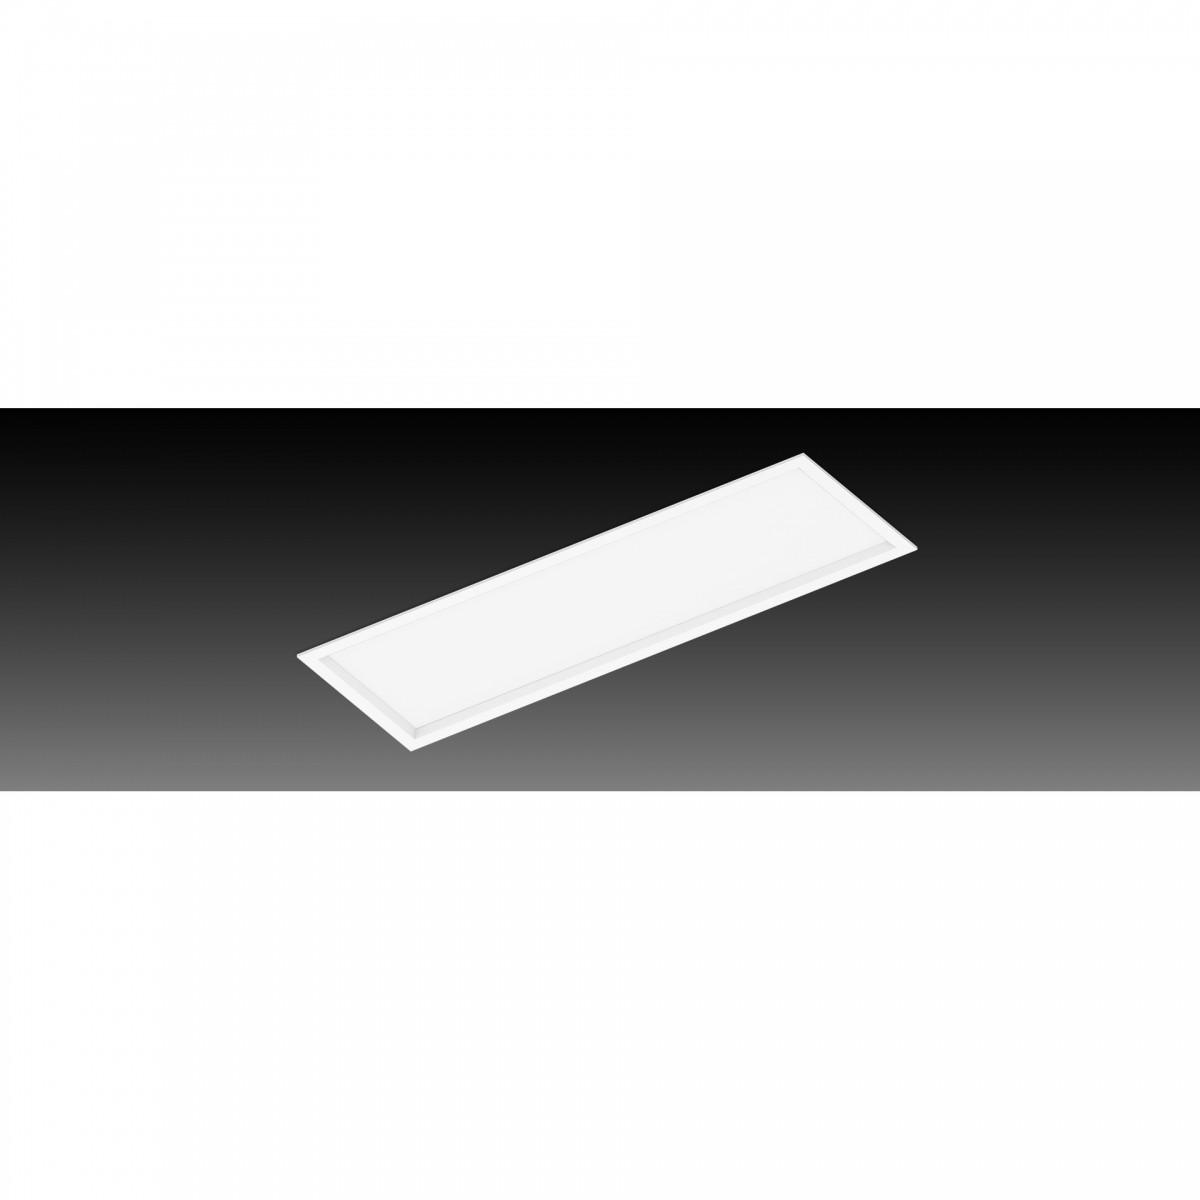 Luminária Embutida 1x14w Branca - Interlight